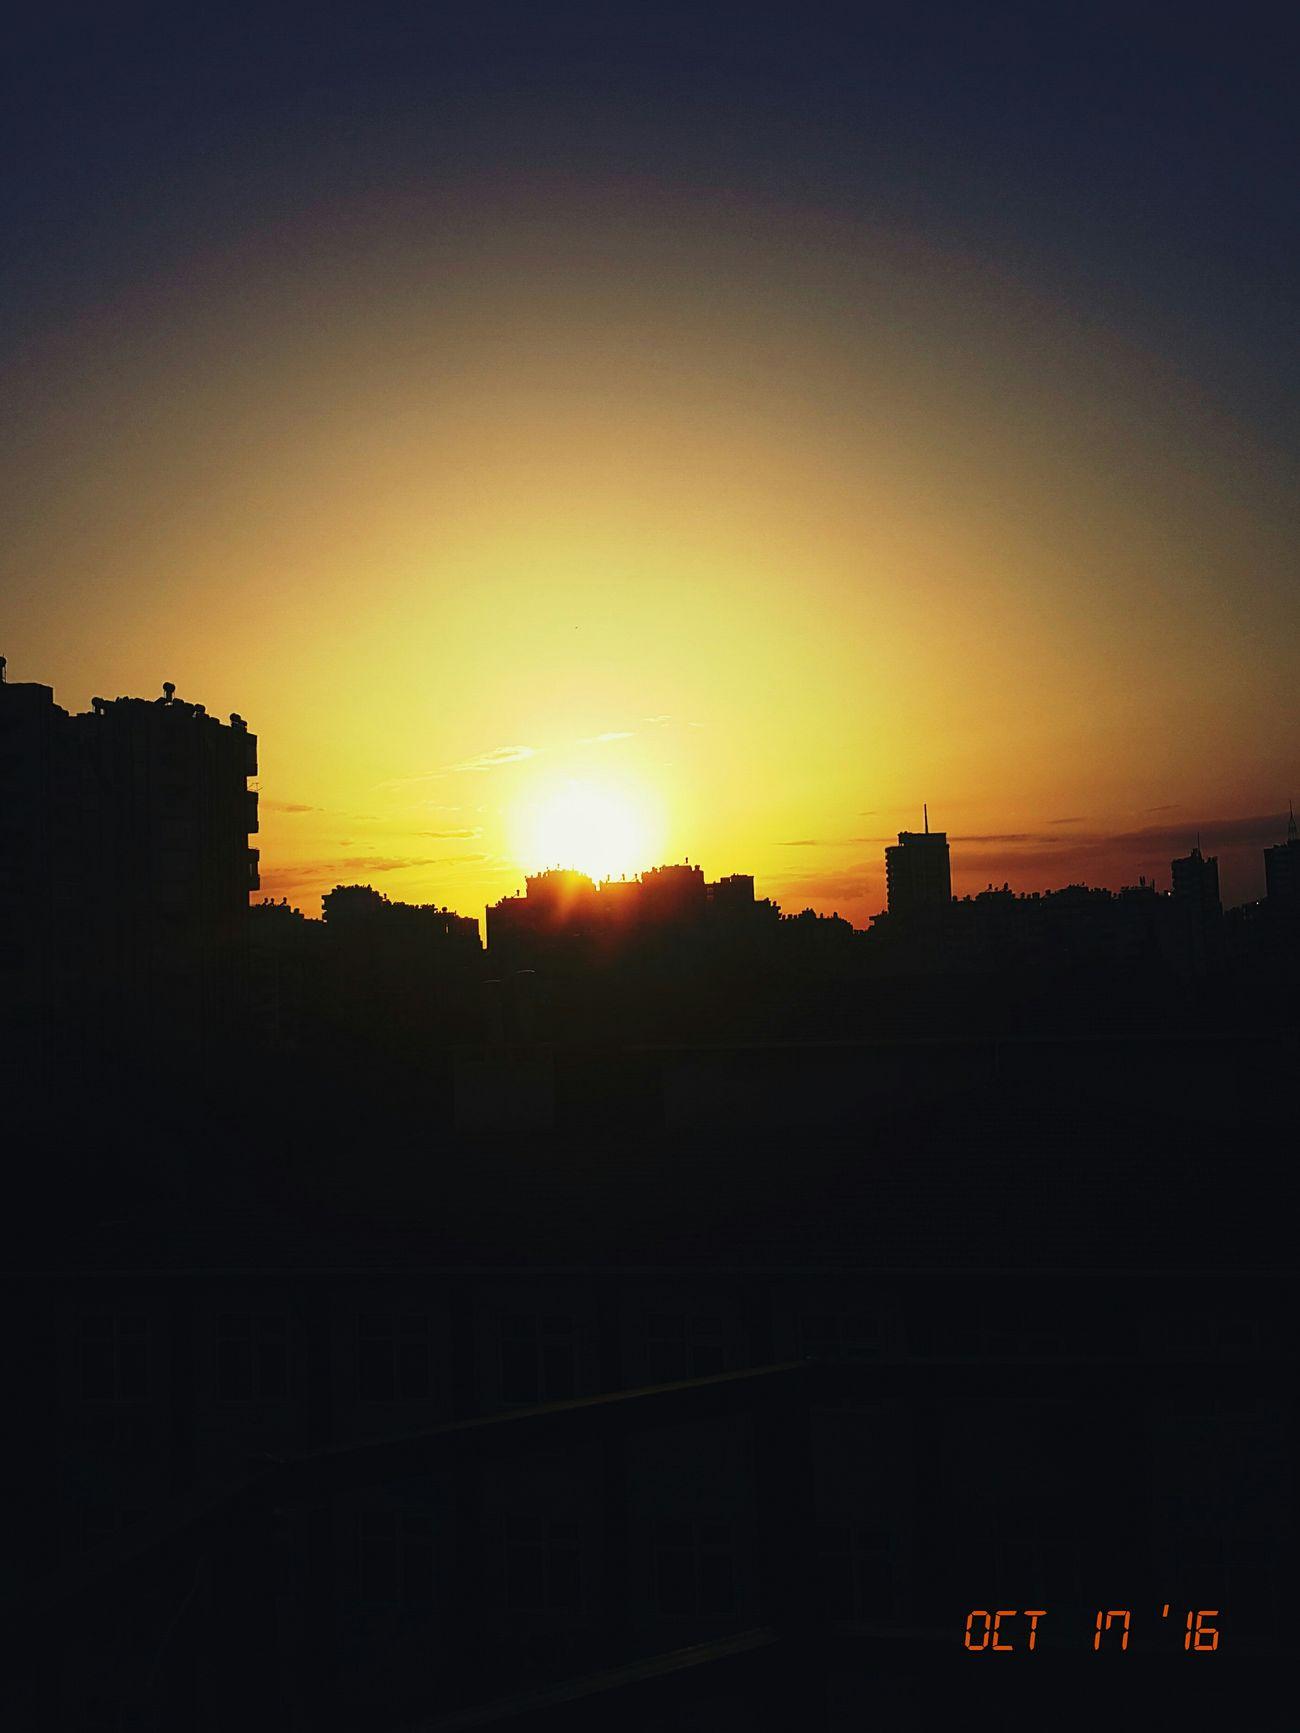 Gunbatimi Gununfotografi Gununkaresi Sunset Sunset Sky Outdoors Nature Tree Social Issues No People Cloud - Sky Beauty In Nature Day